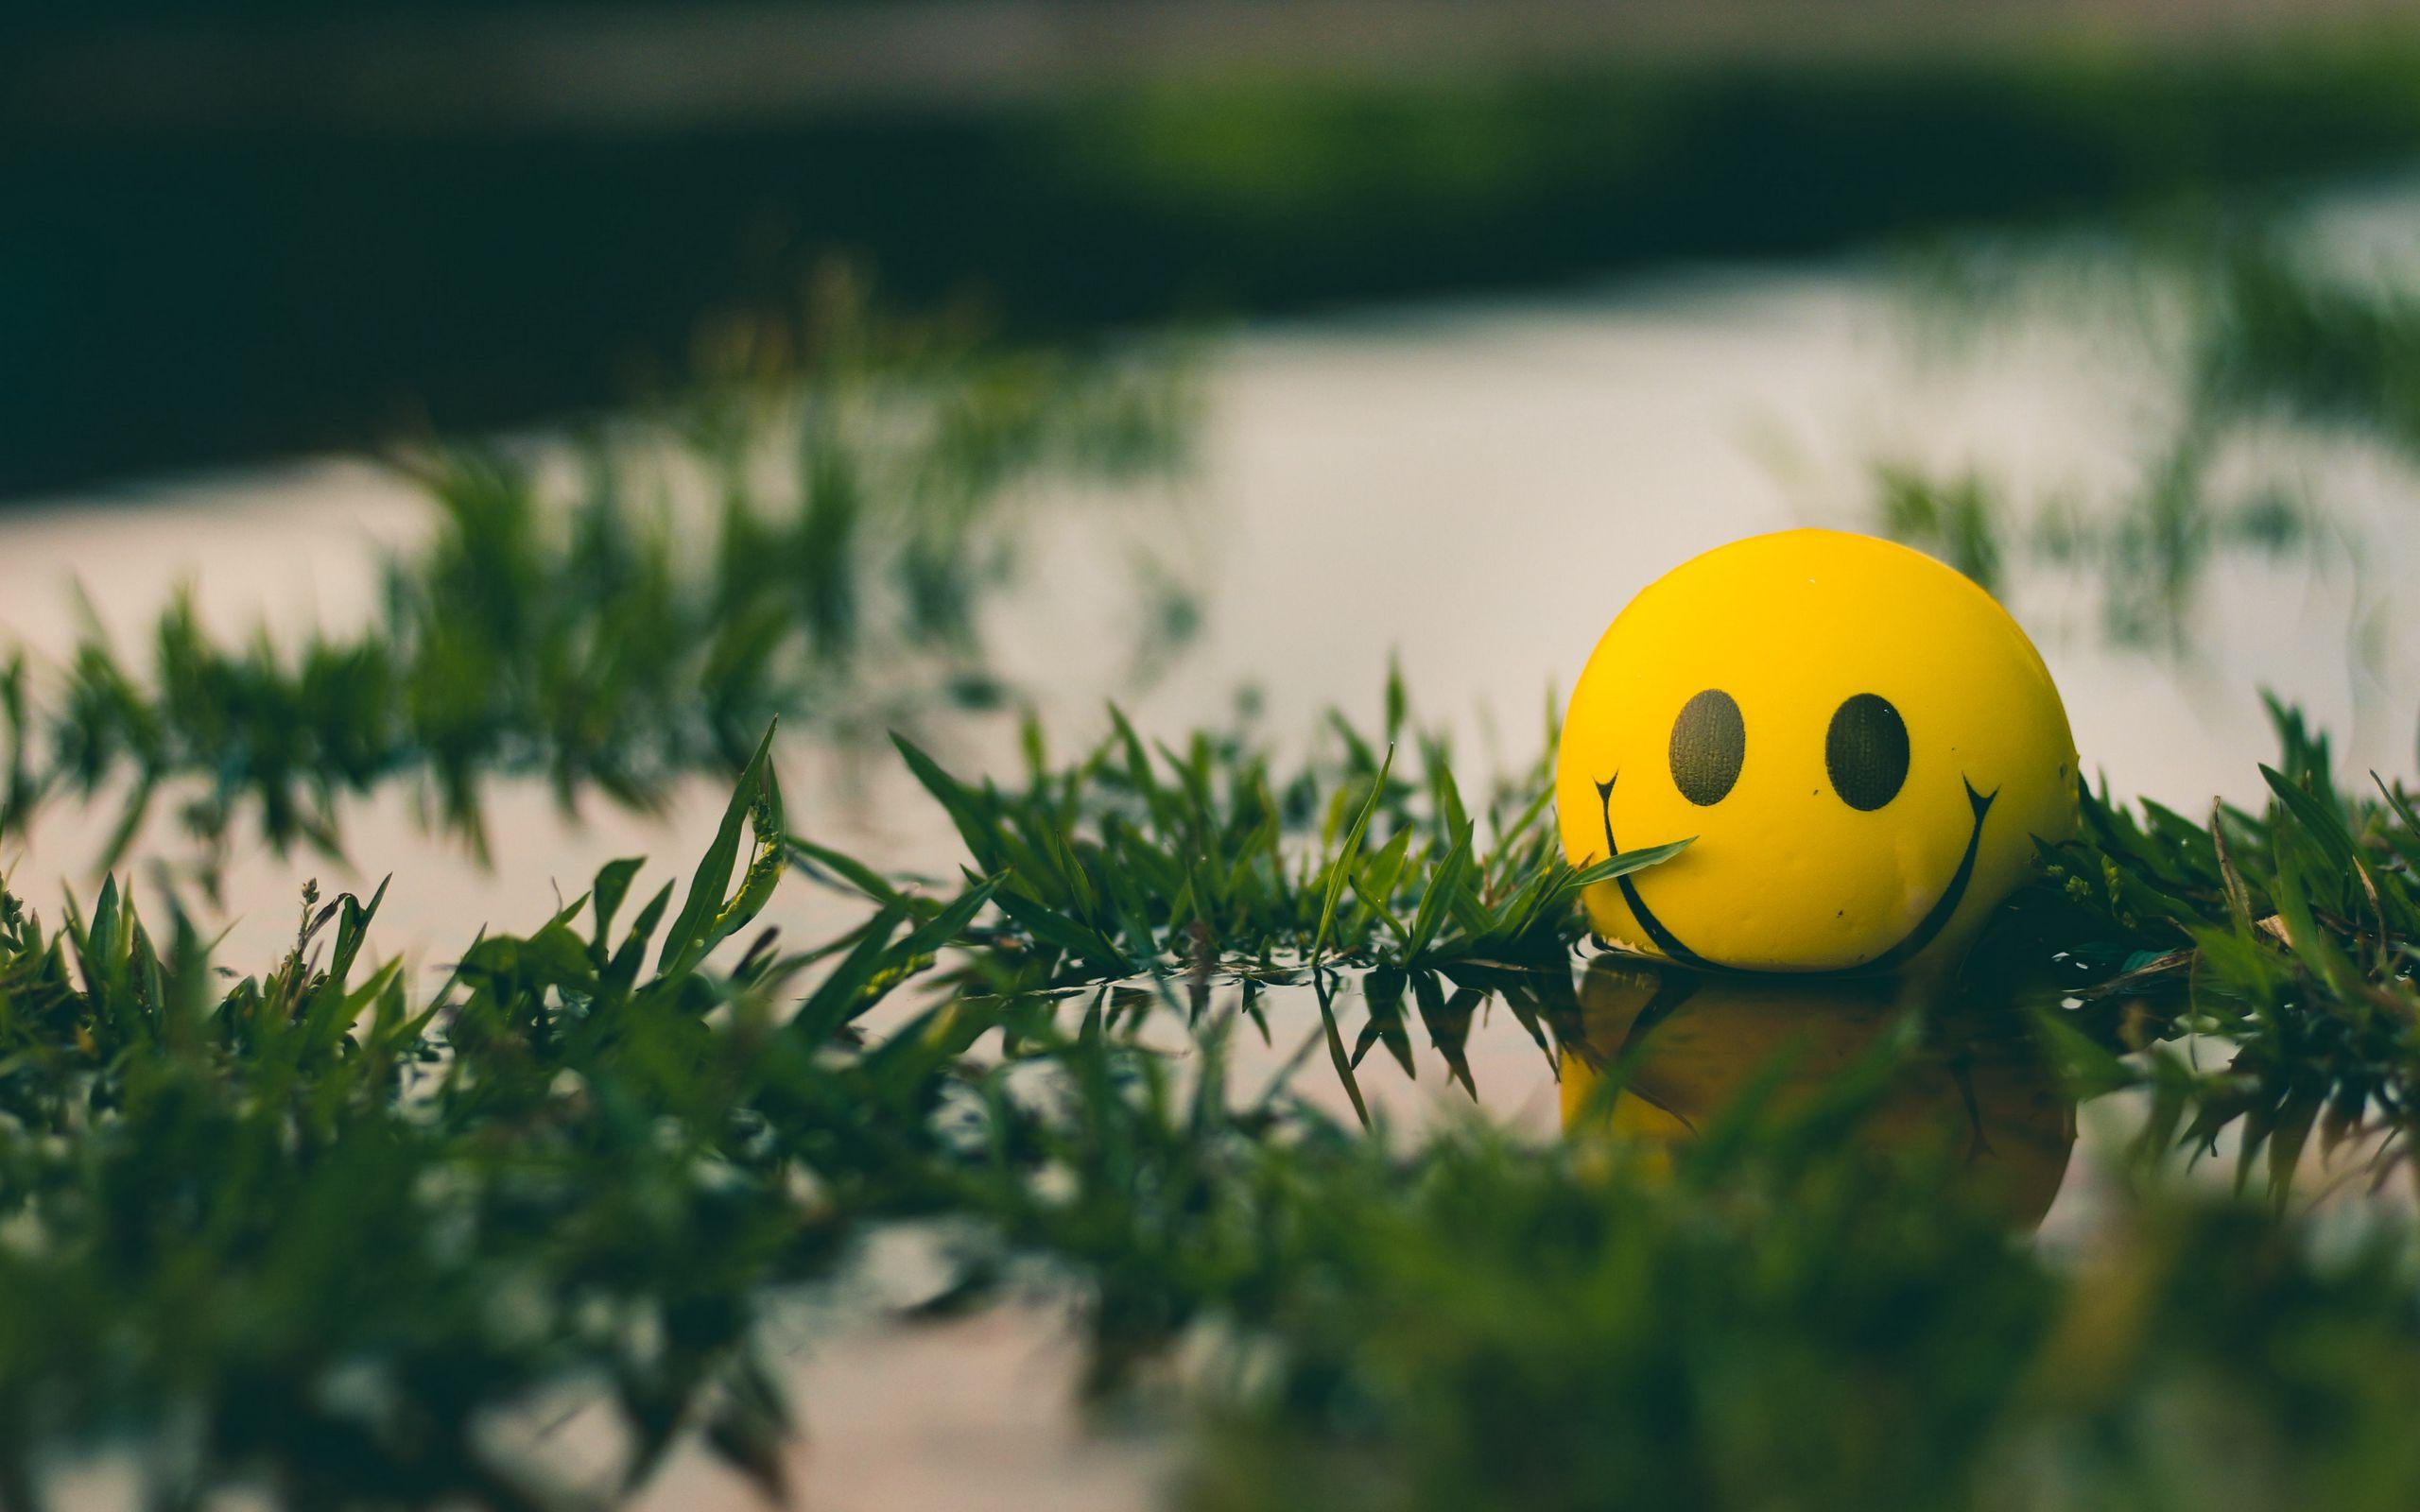 2560x1600 Wallpaper ball, smile, smiley, grass, water